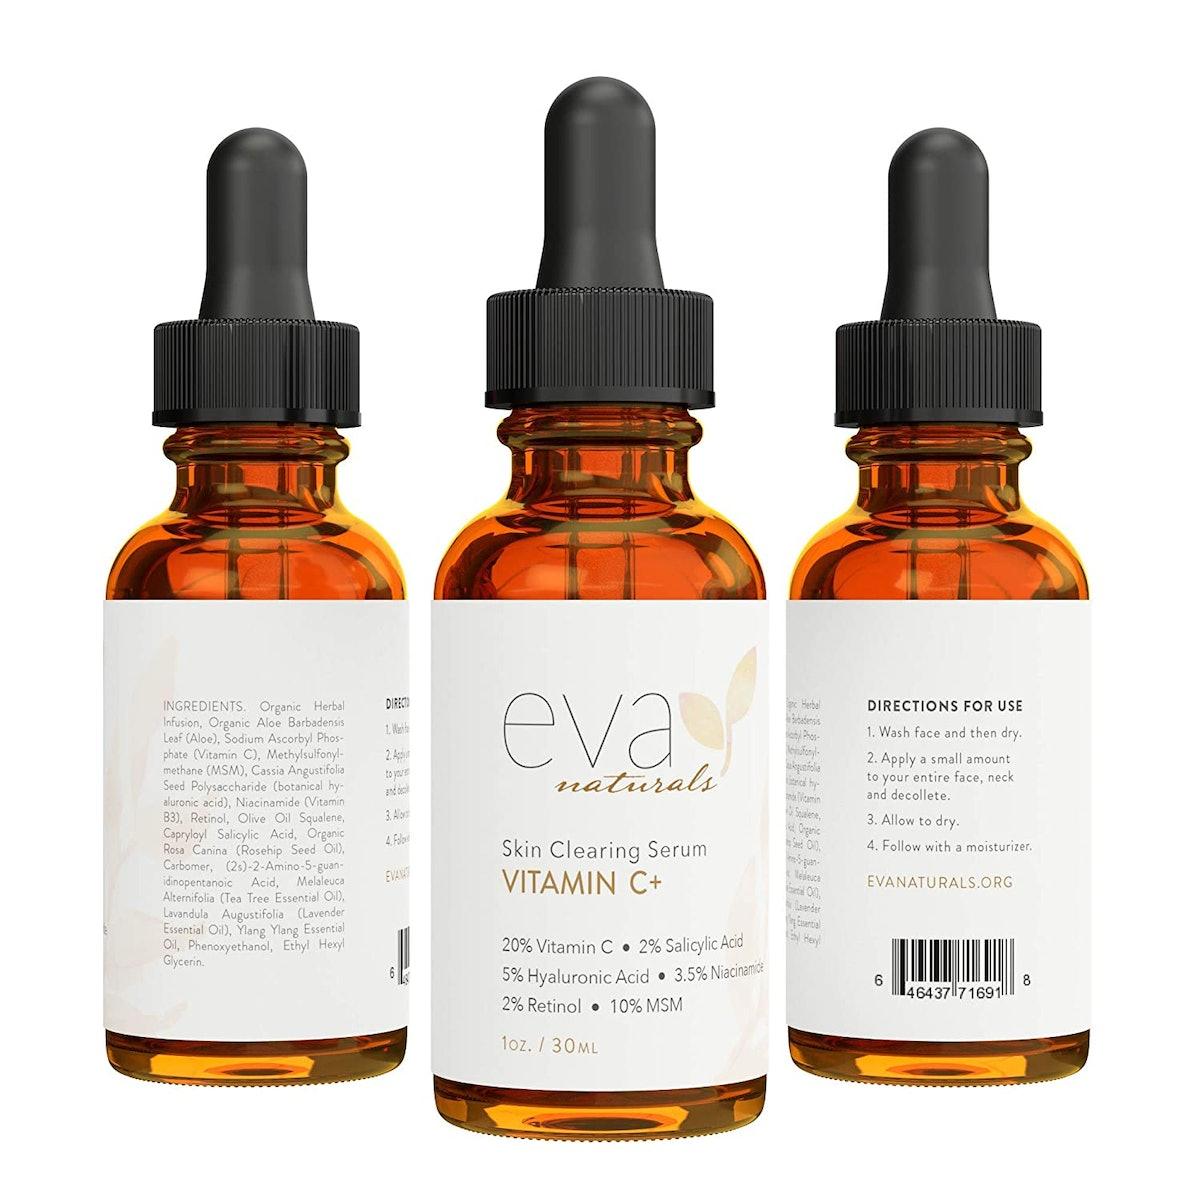 Skin Clearing Serum Vitamin C+